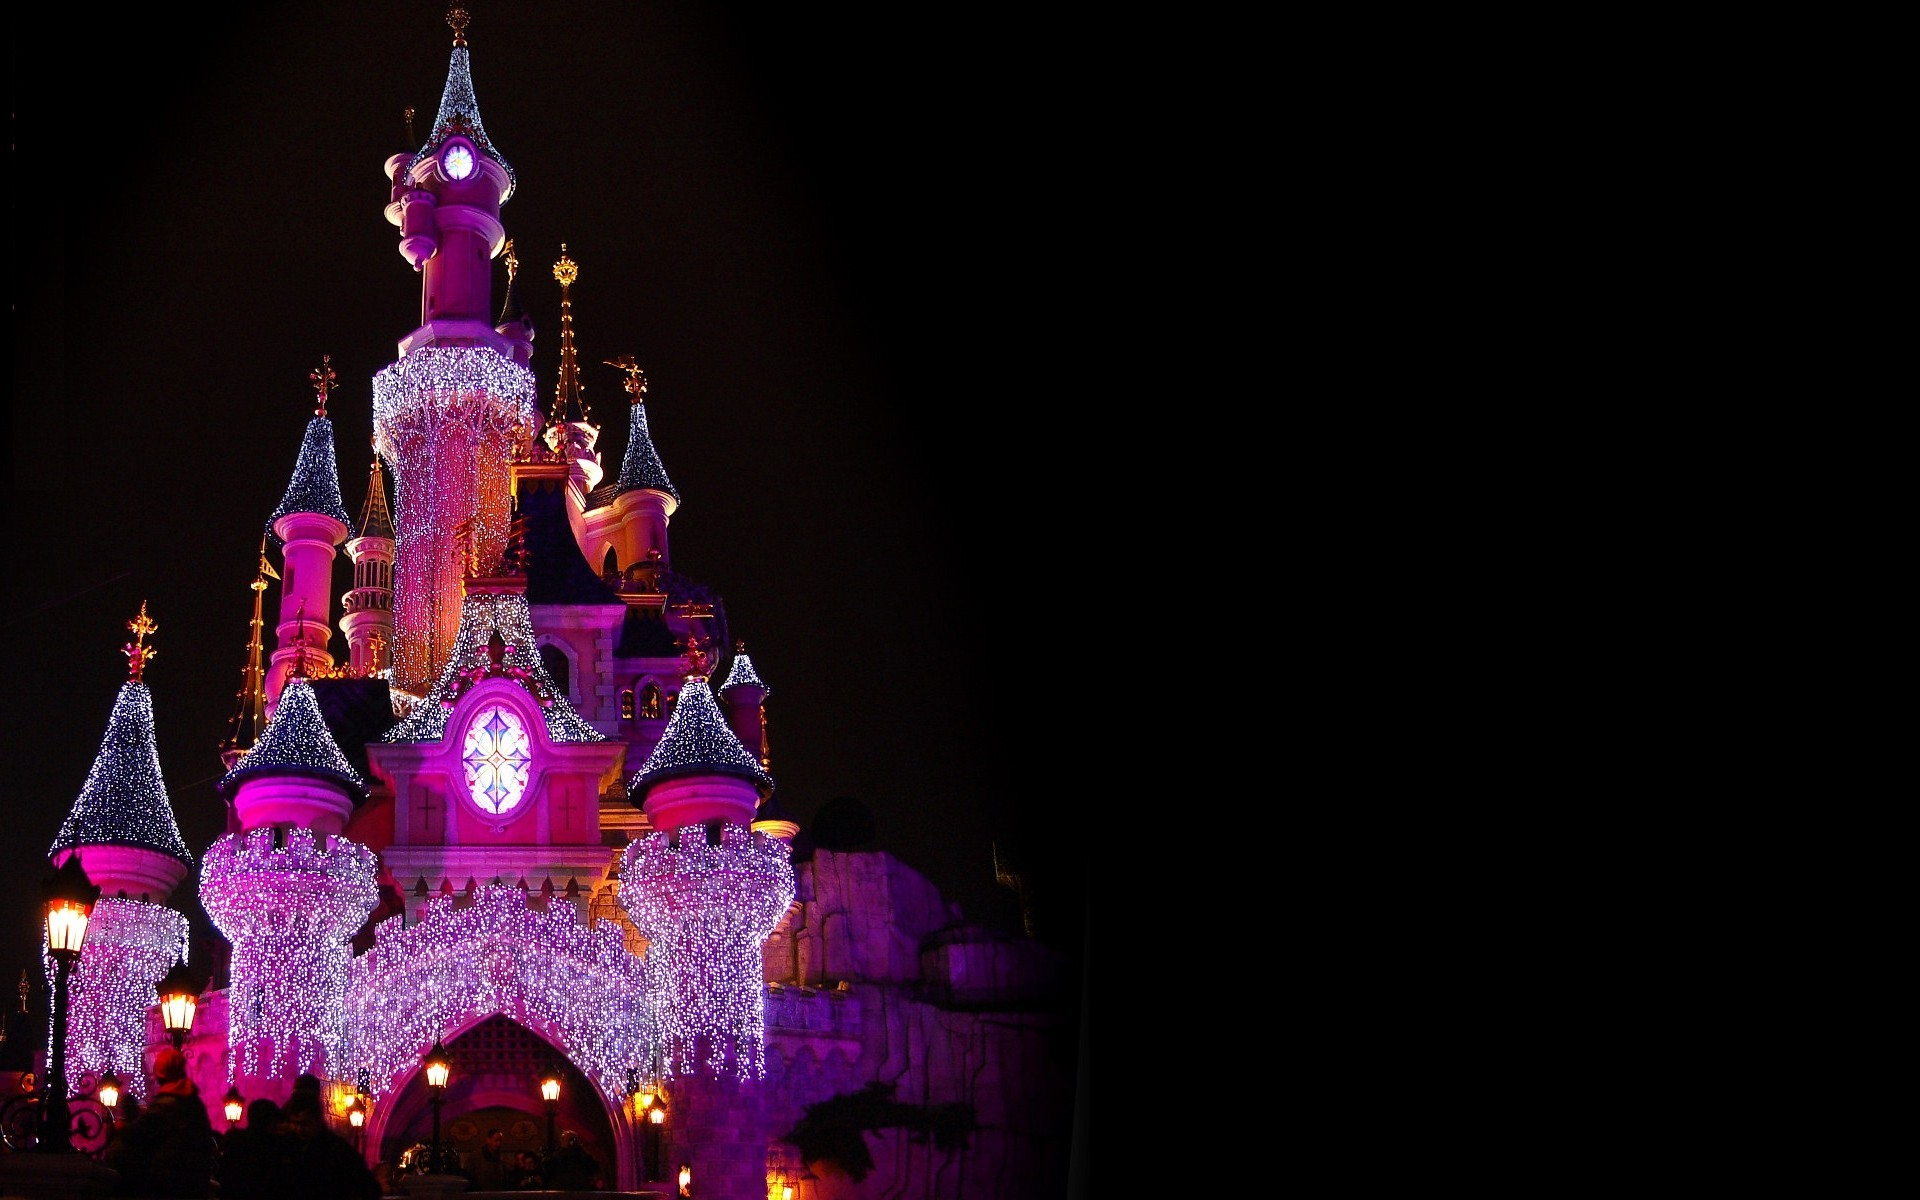 Cinderella Castle   Walt Disney World wallpaper 6410 1920x1200